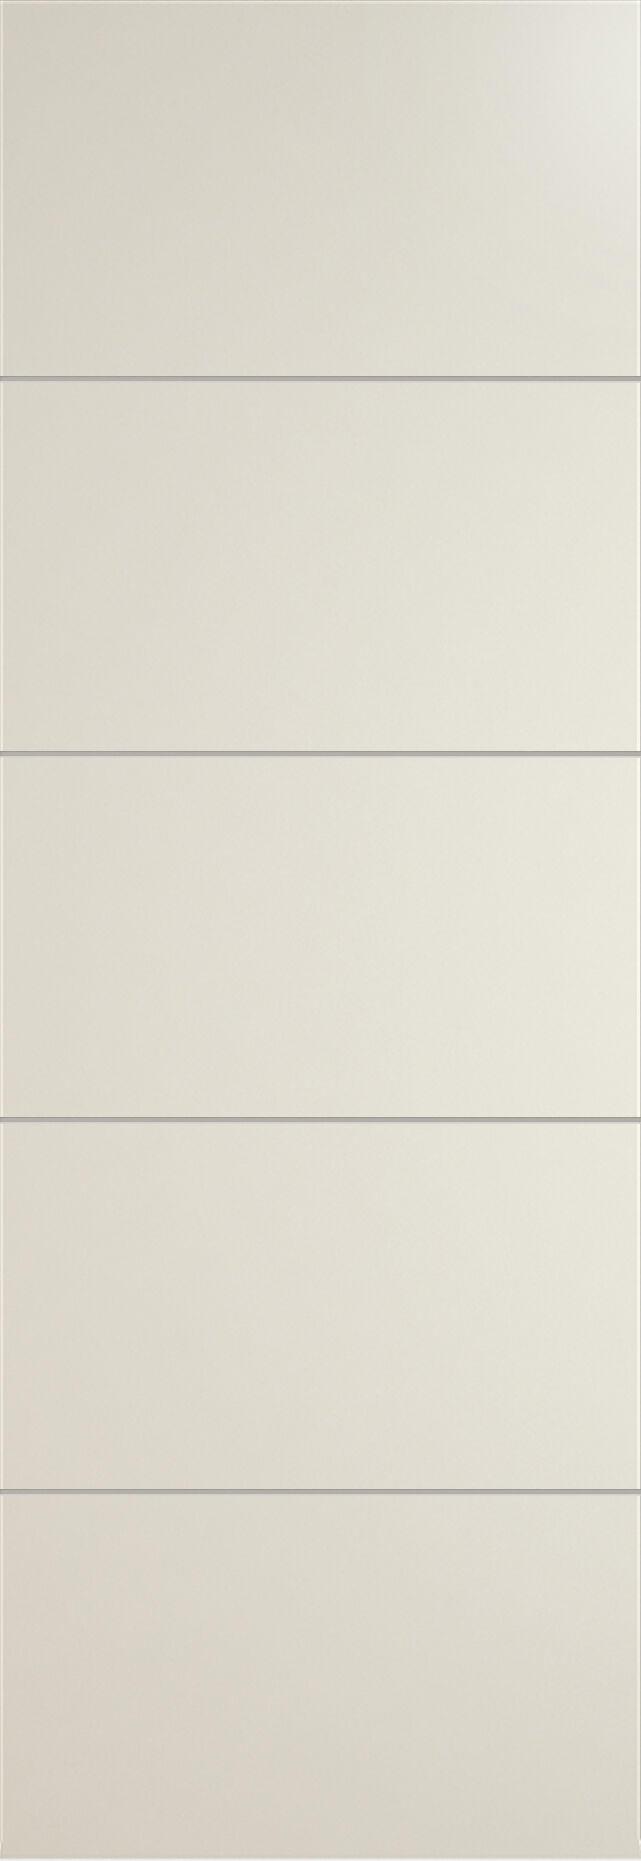 Tivoli Д-2 Invisible цвет - Жемчужная эмаль Без стекла (ДГ)